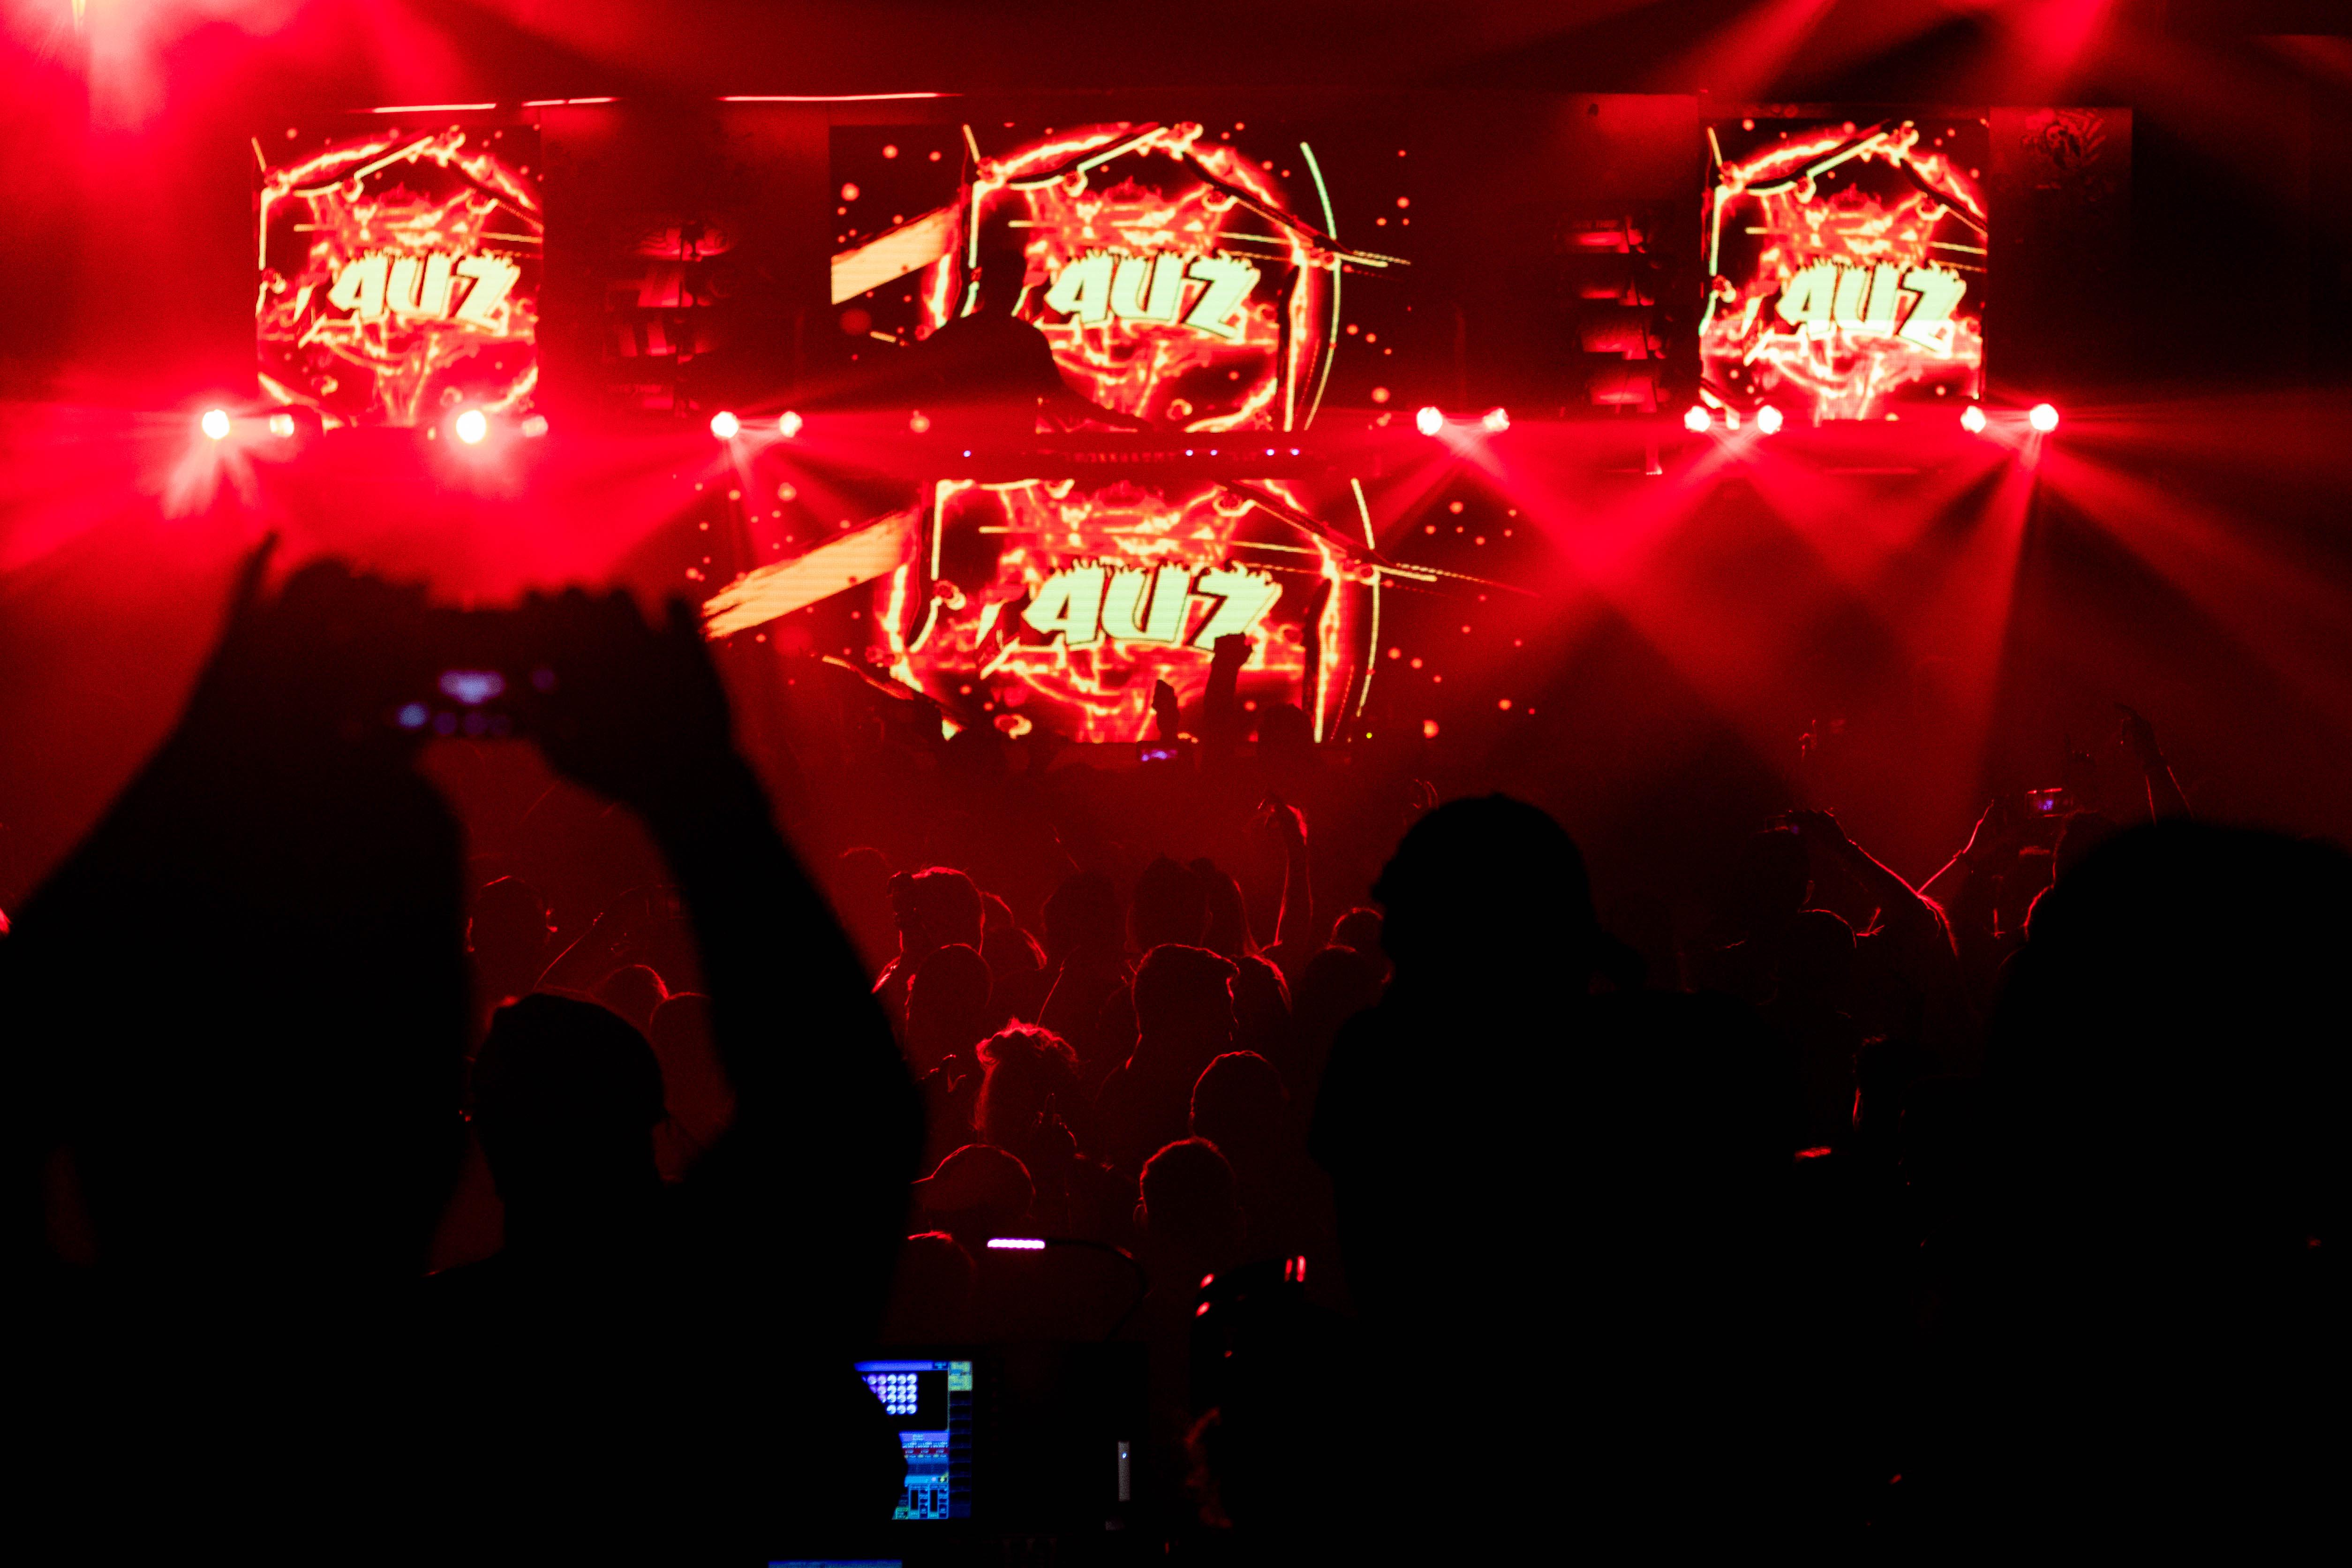 Photos: JAUZ at The Bourbon Theatre 10 23 18 - KZUM 89 3 FM